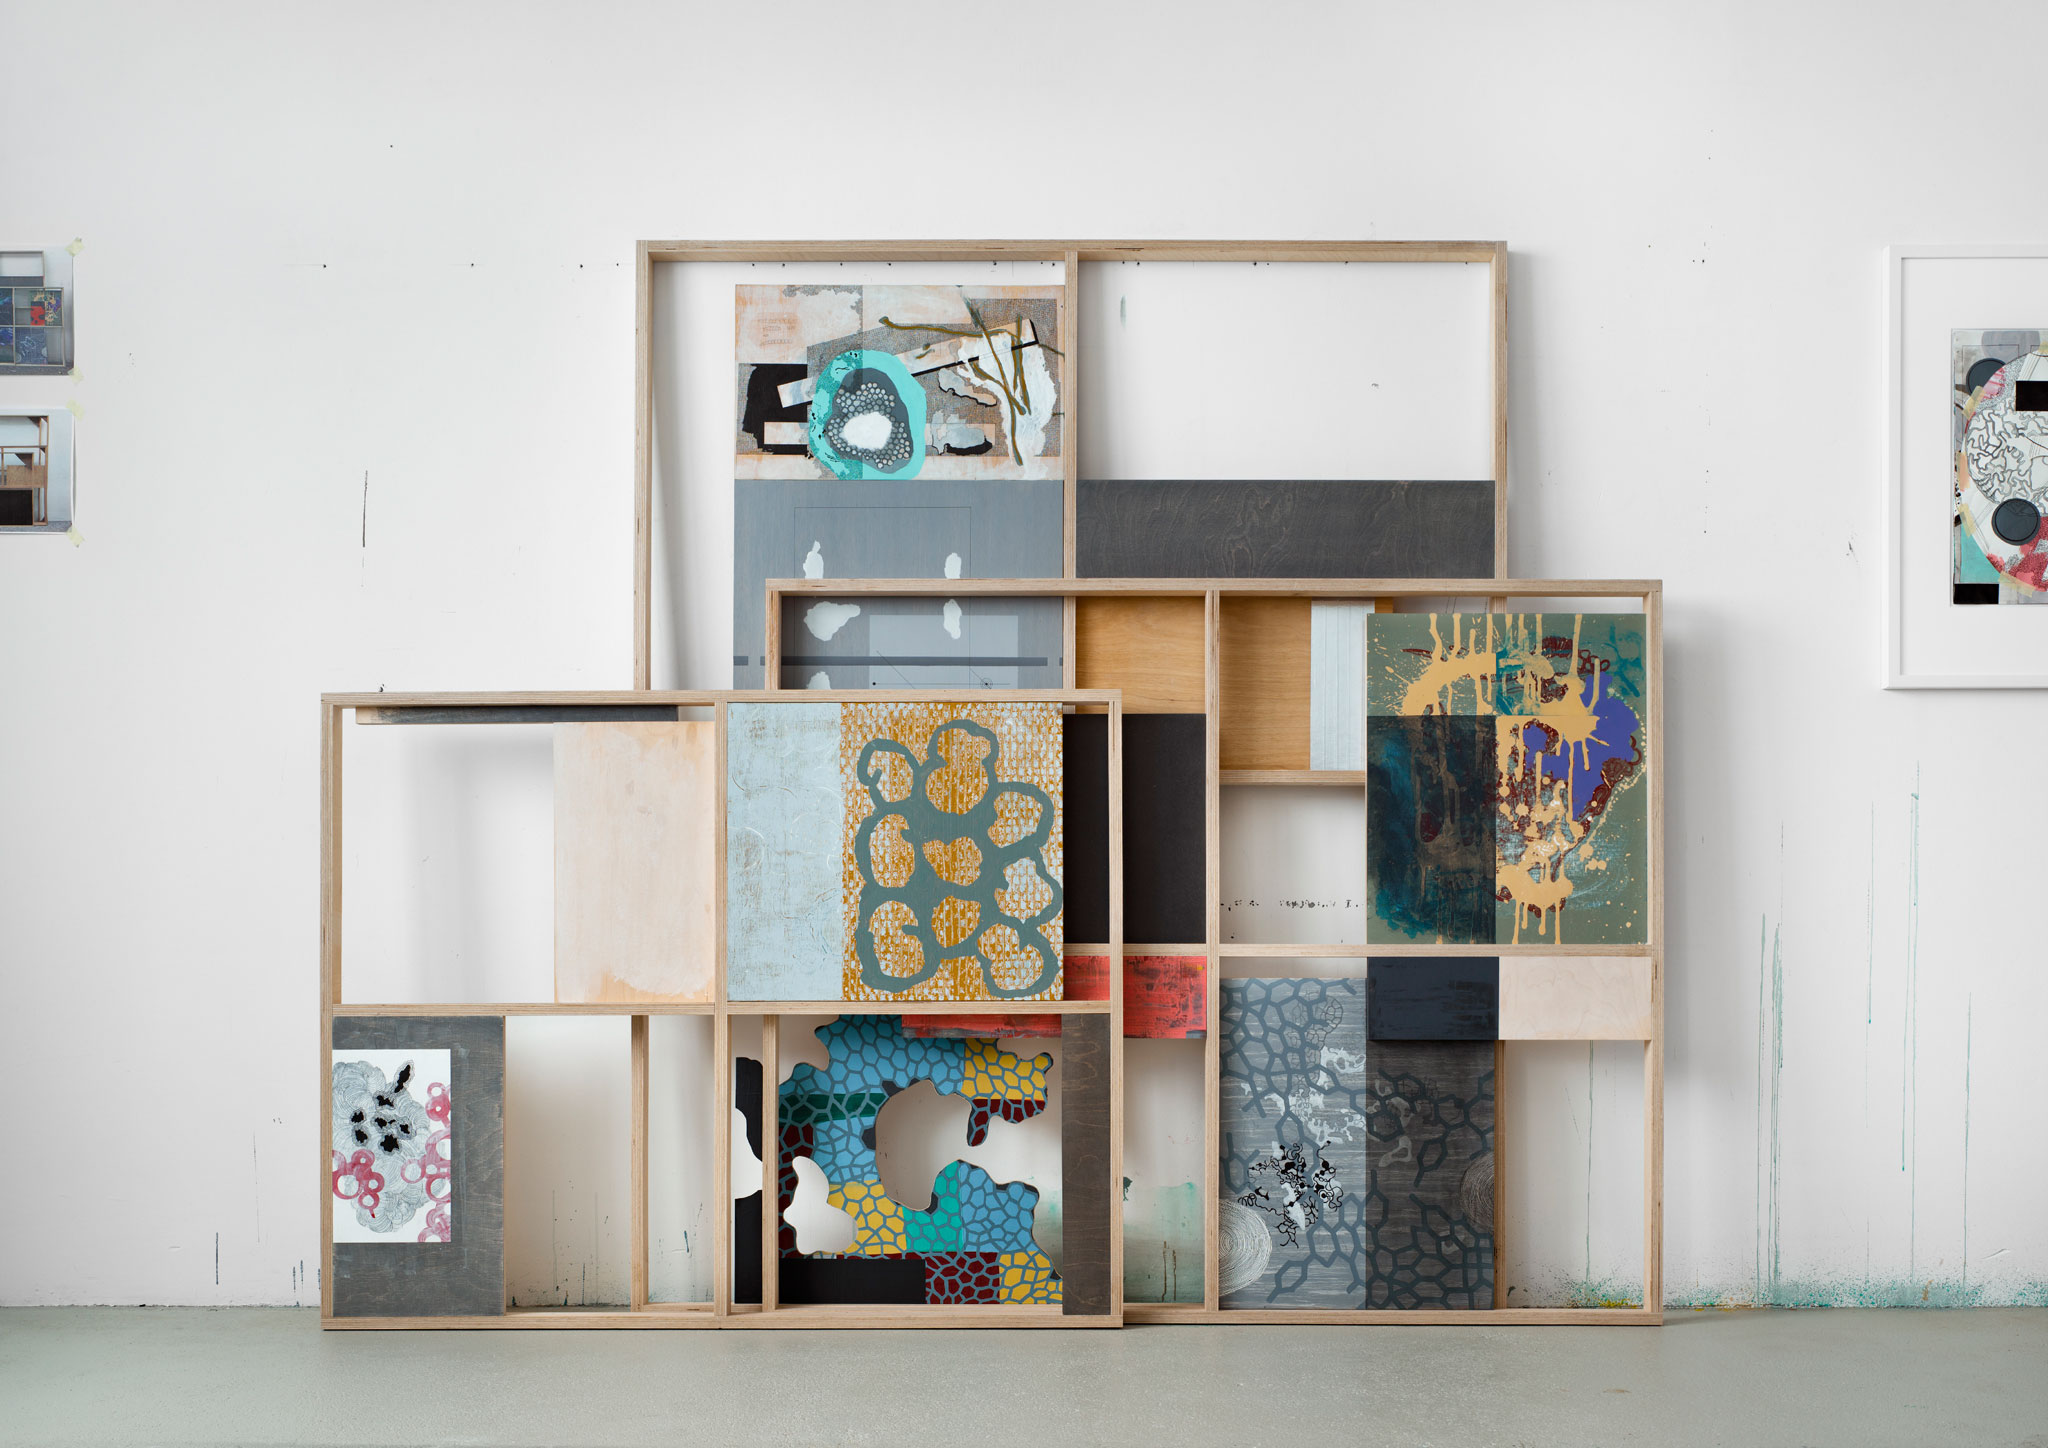 Michael Lukas, OccupiedCorner, Diverse Materialien, 189 x 217 x 24,5 cm, 2018 (Foto: Magdalena Menzinger)